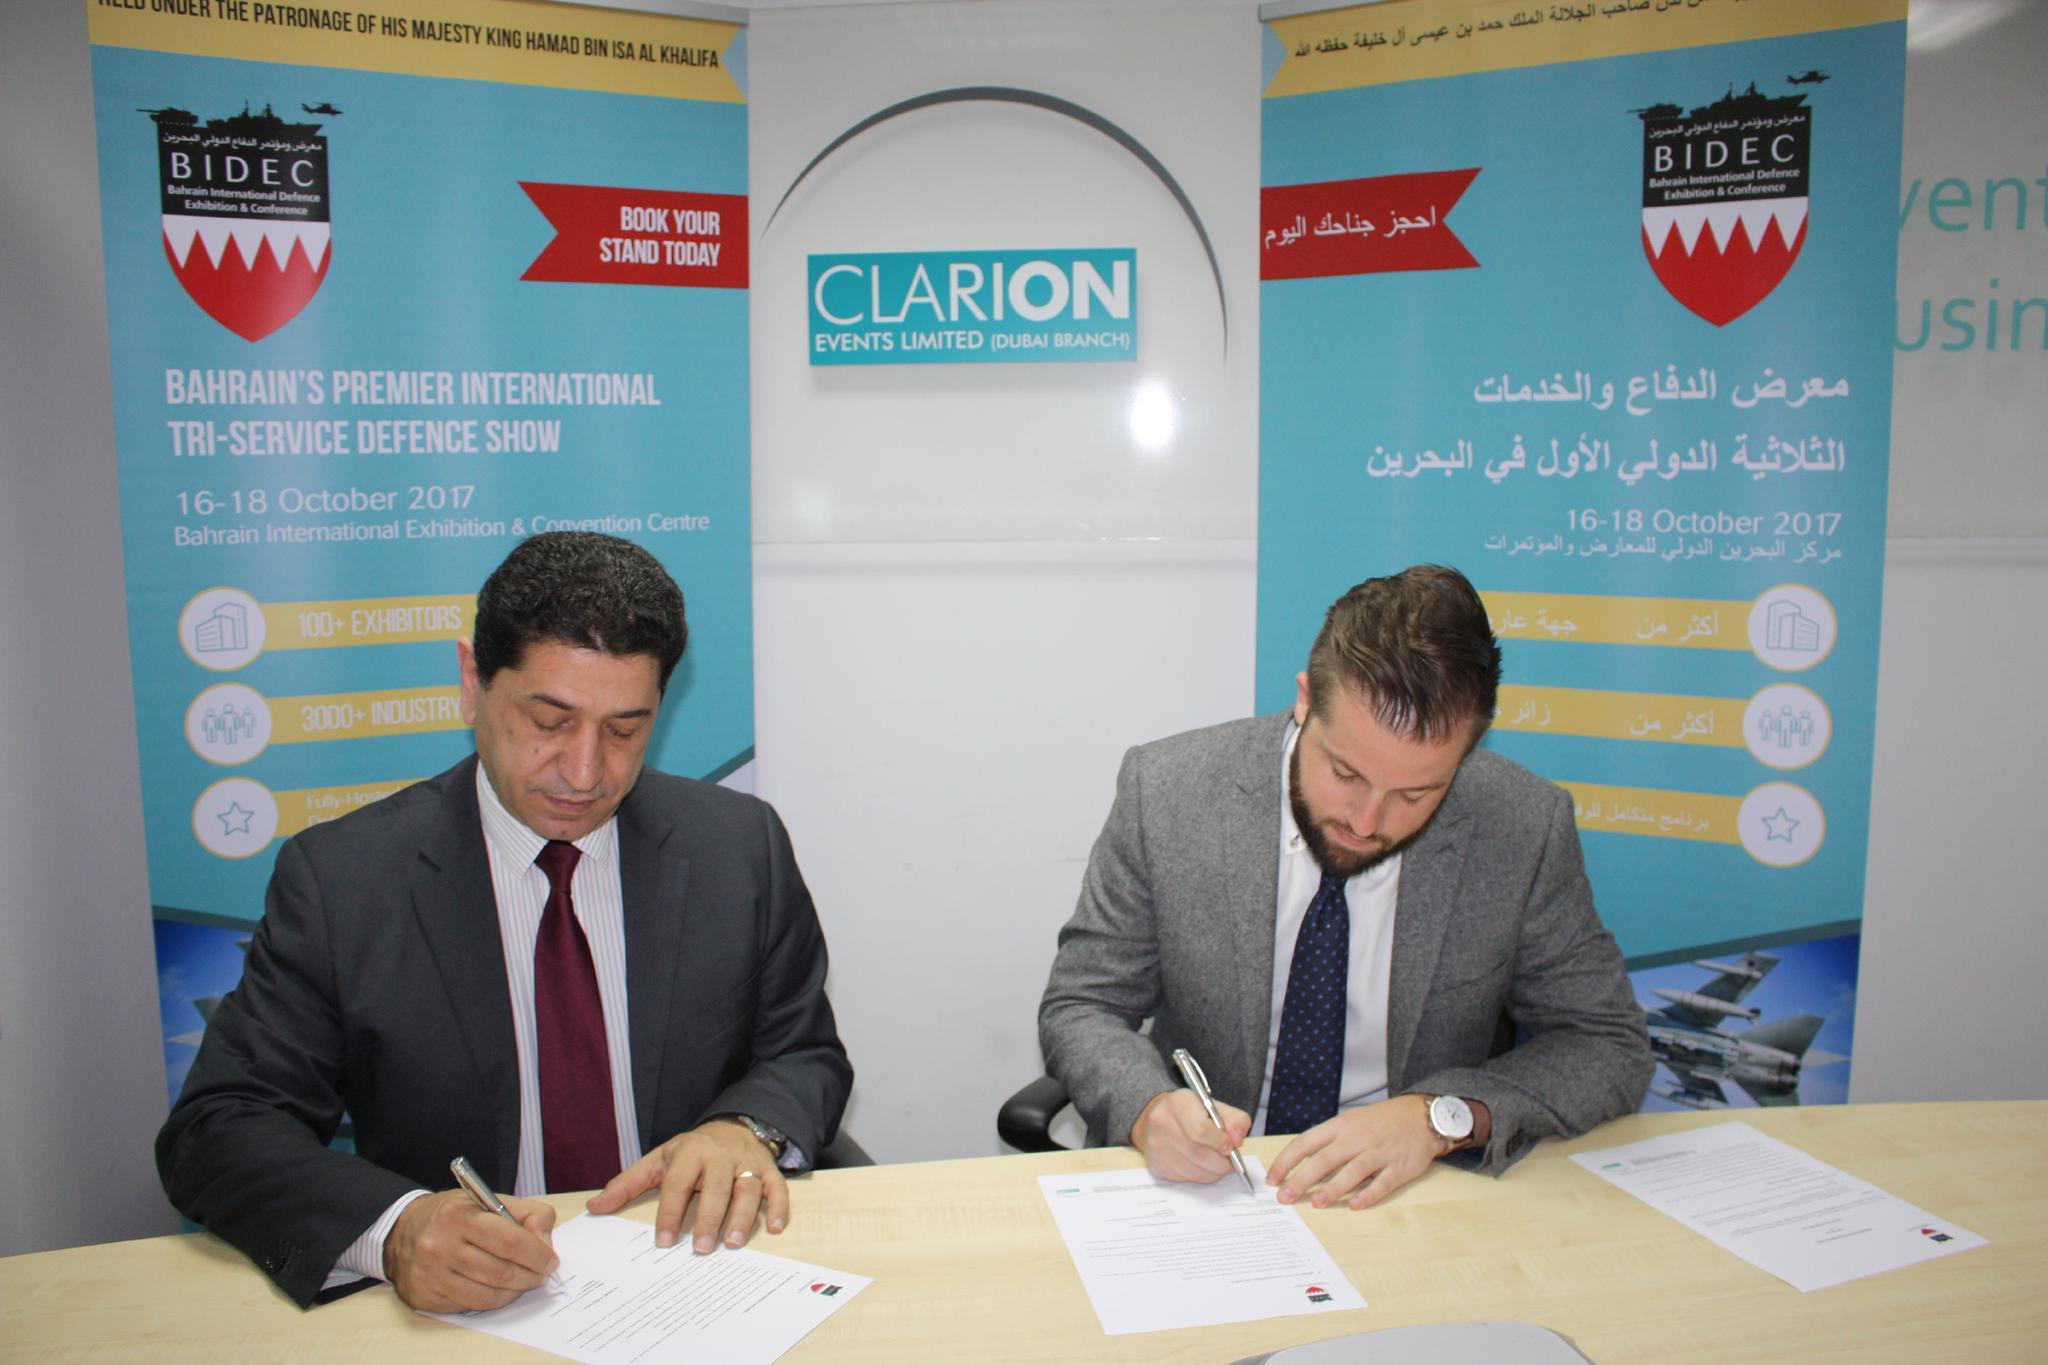 Arab National Security Forum, NSA Forum announced as Official Arabic Online Media Partner for BIDEC 2017